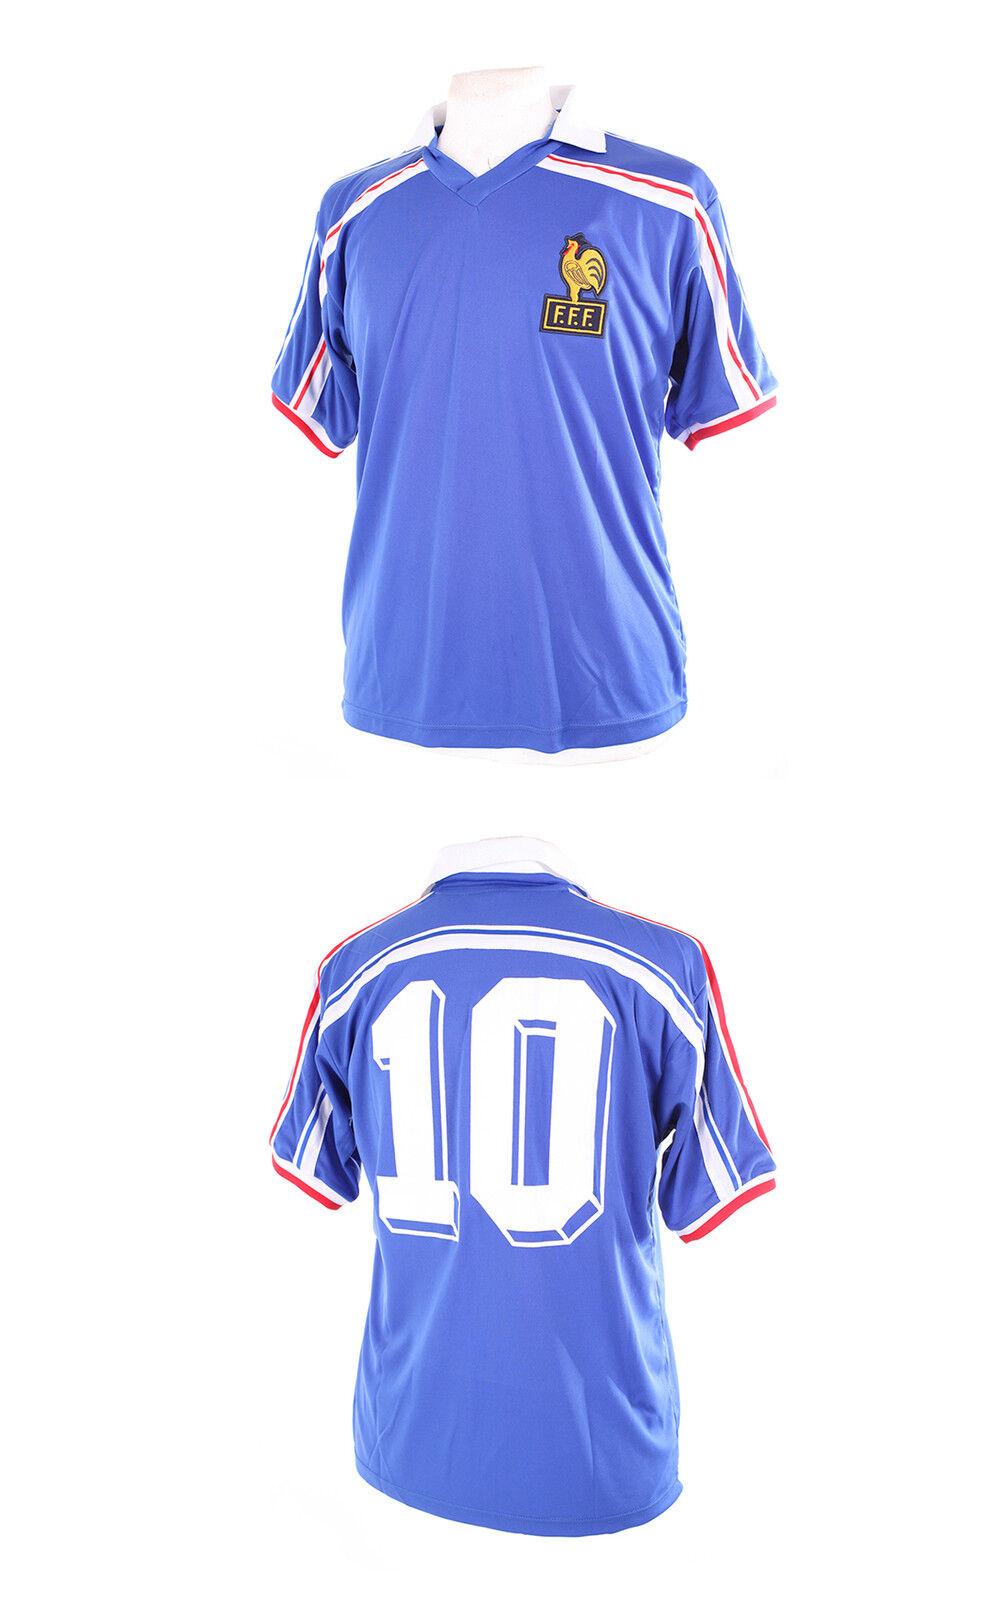 FRANCE RETRO 1986 WORLD CUP PLATINI 10 FOOTBALL SHIRT MAILLOT XL NEW EURO 2016